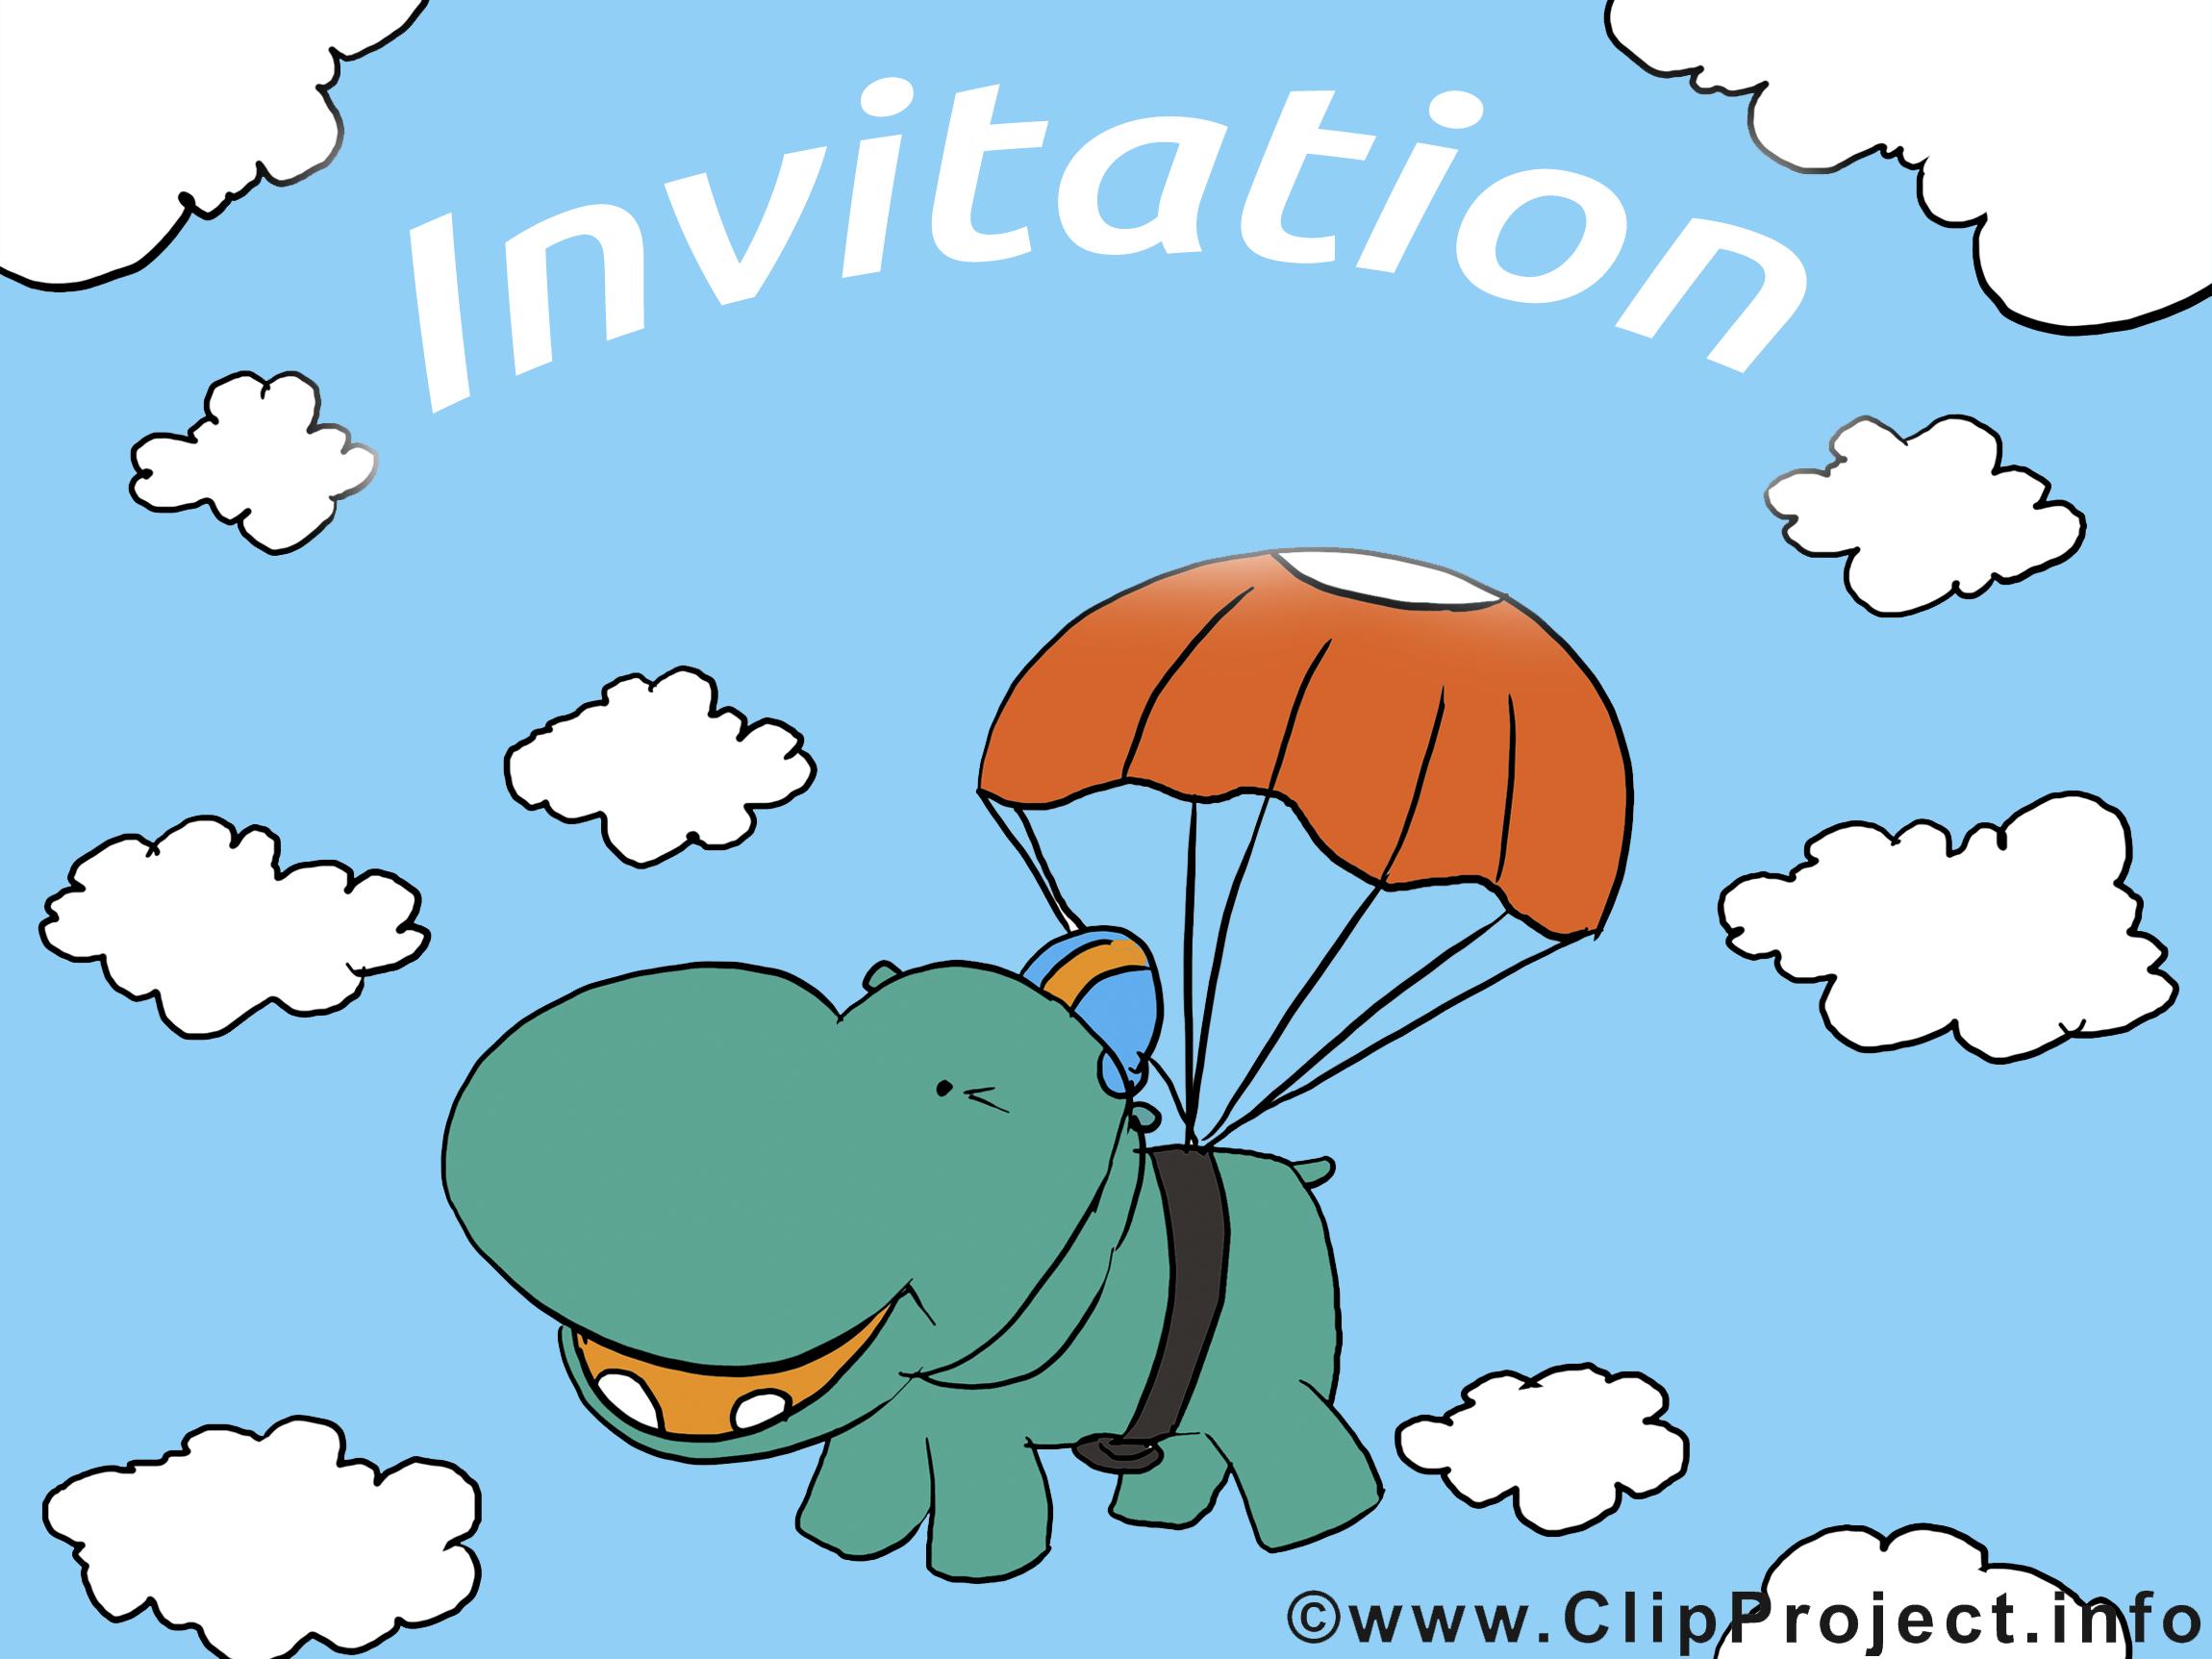 Hippopotame illustration - Invitation images